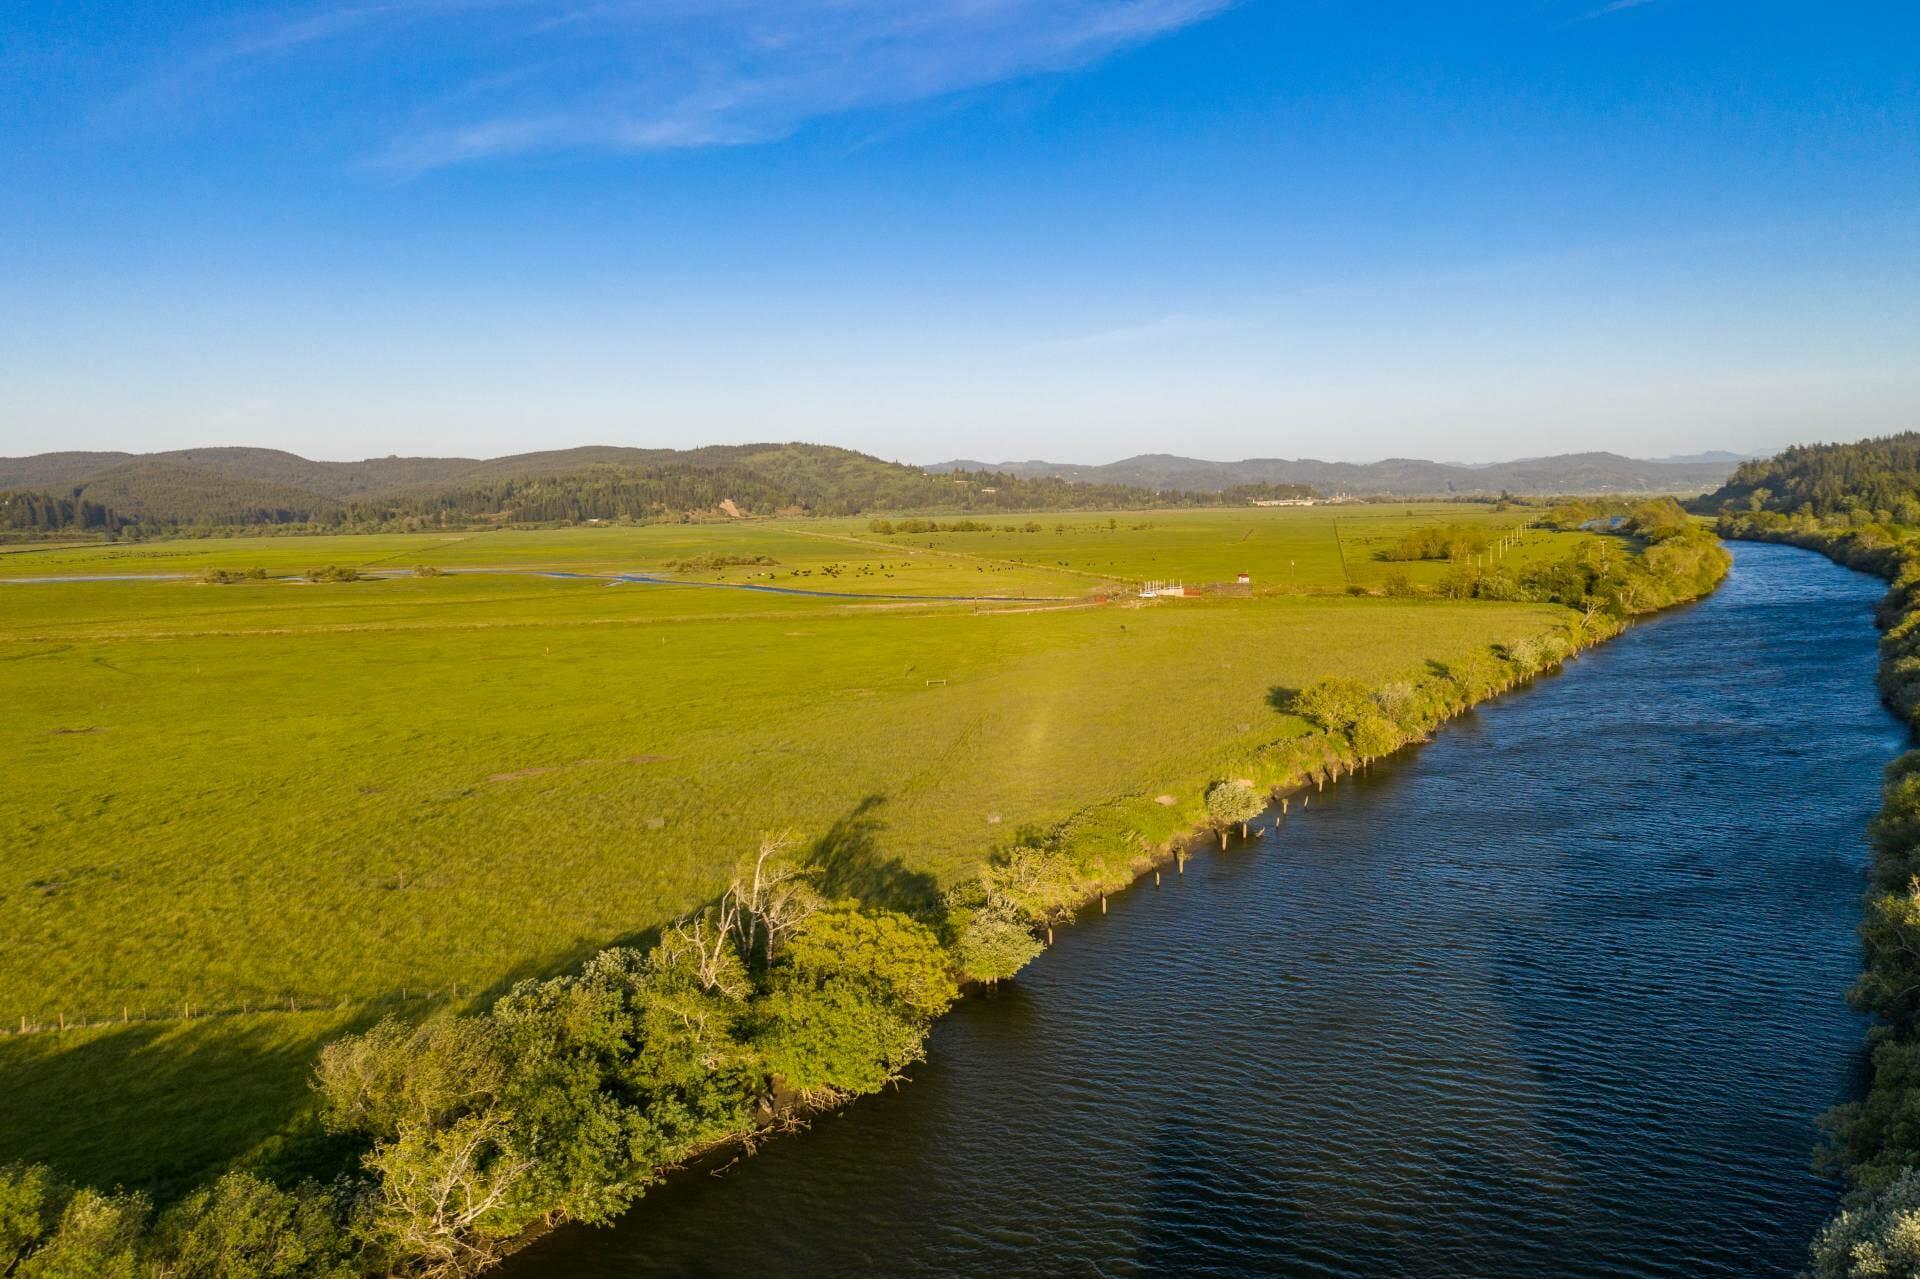 Hart's River Ranch